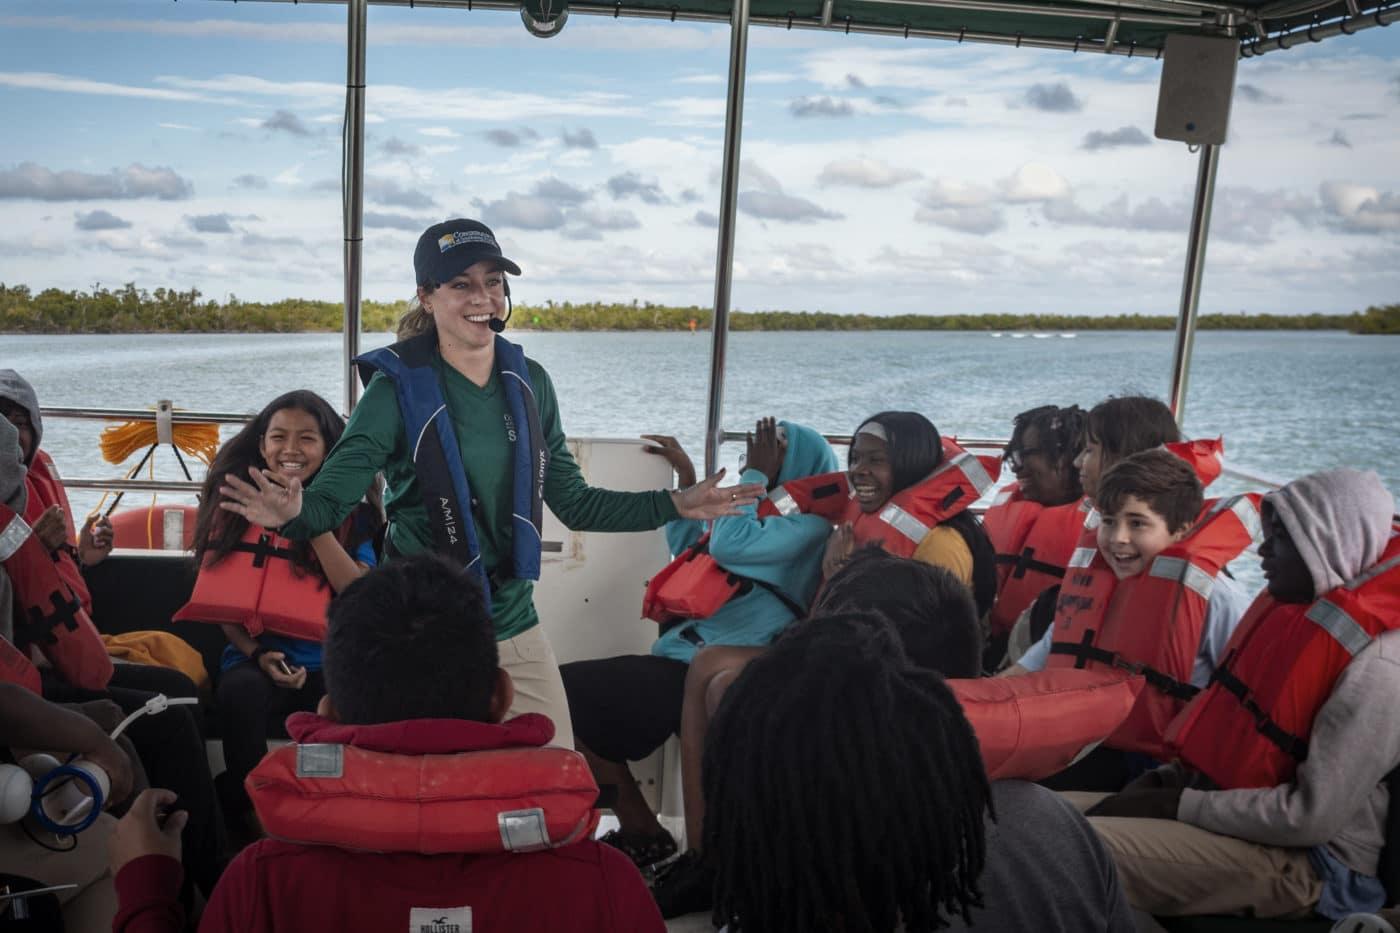 Tonya Zadrozny Leads A SURVIVORS Program